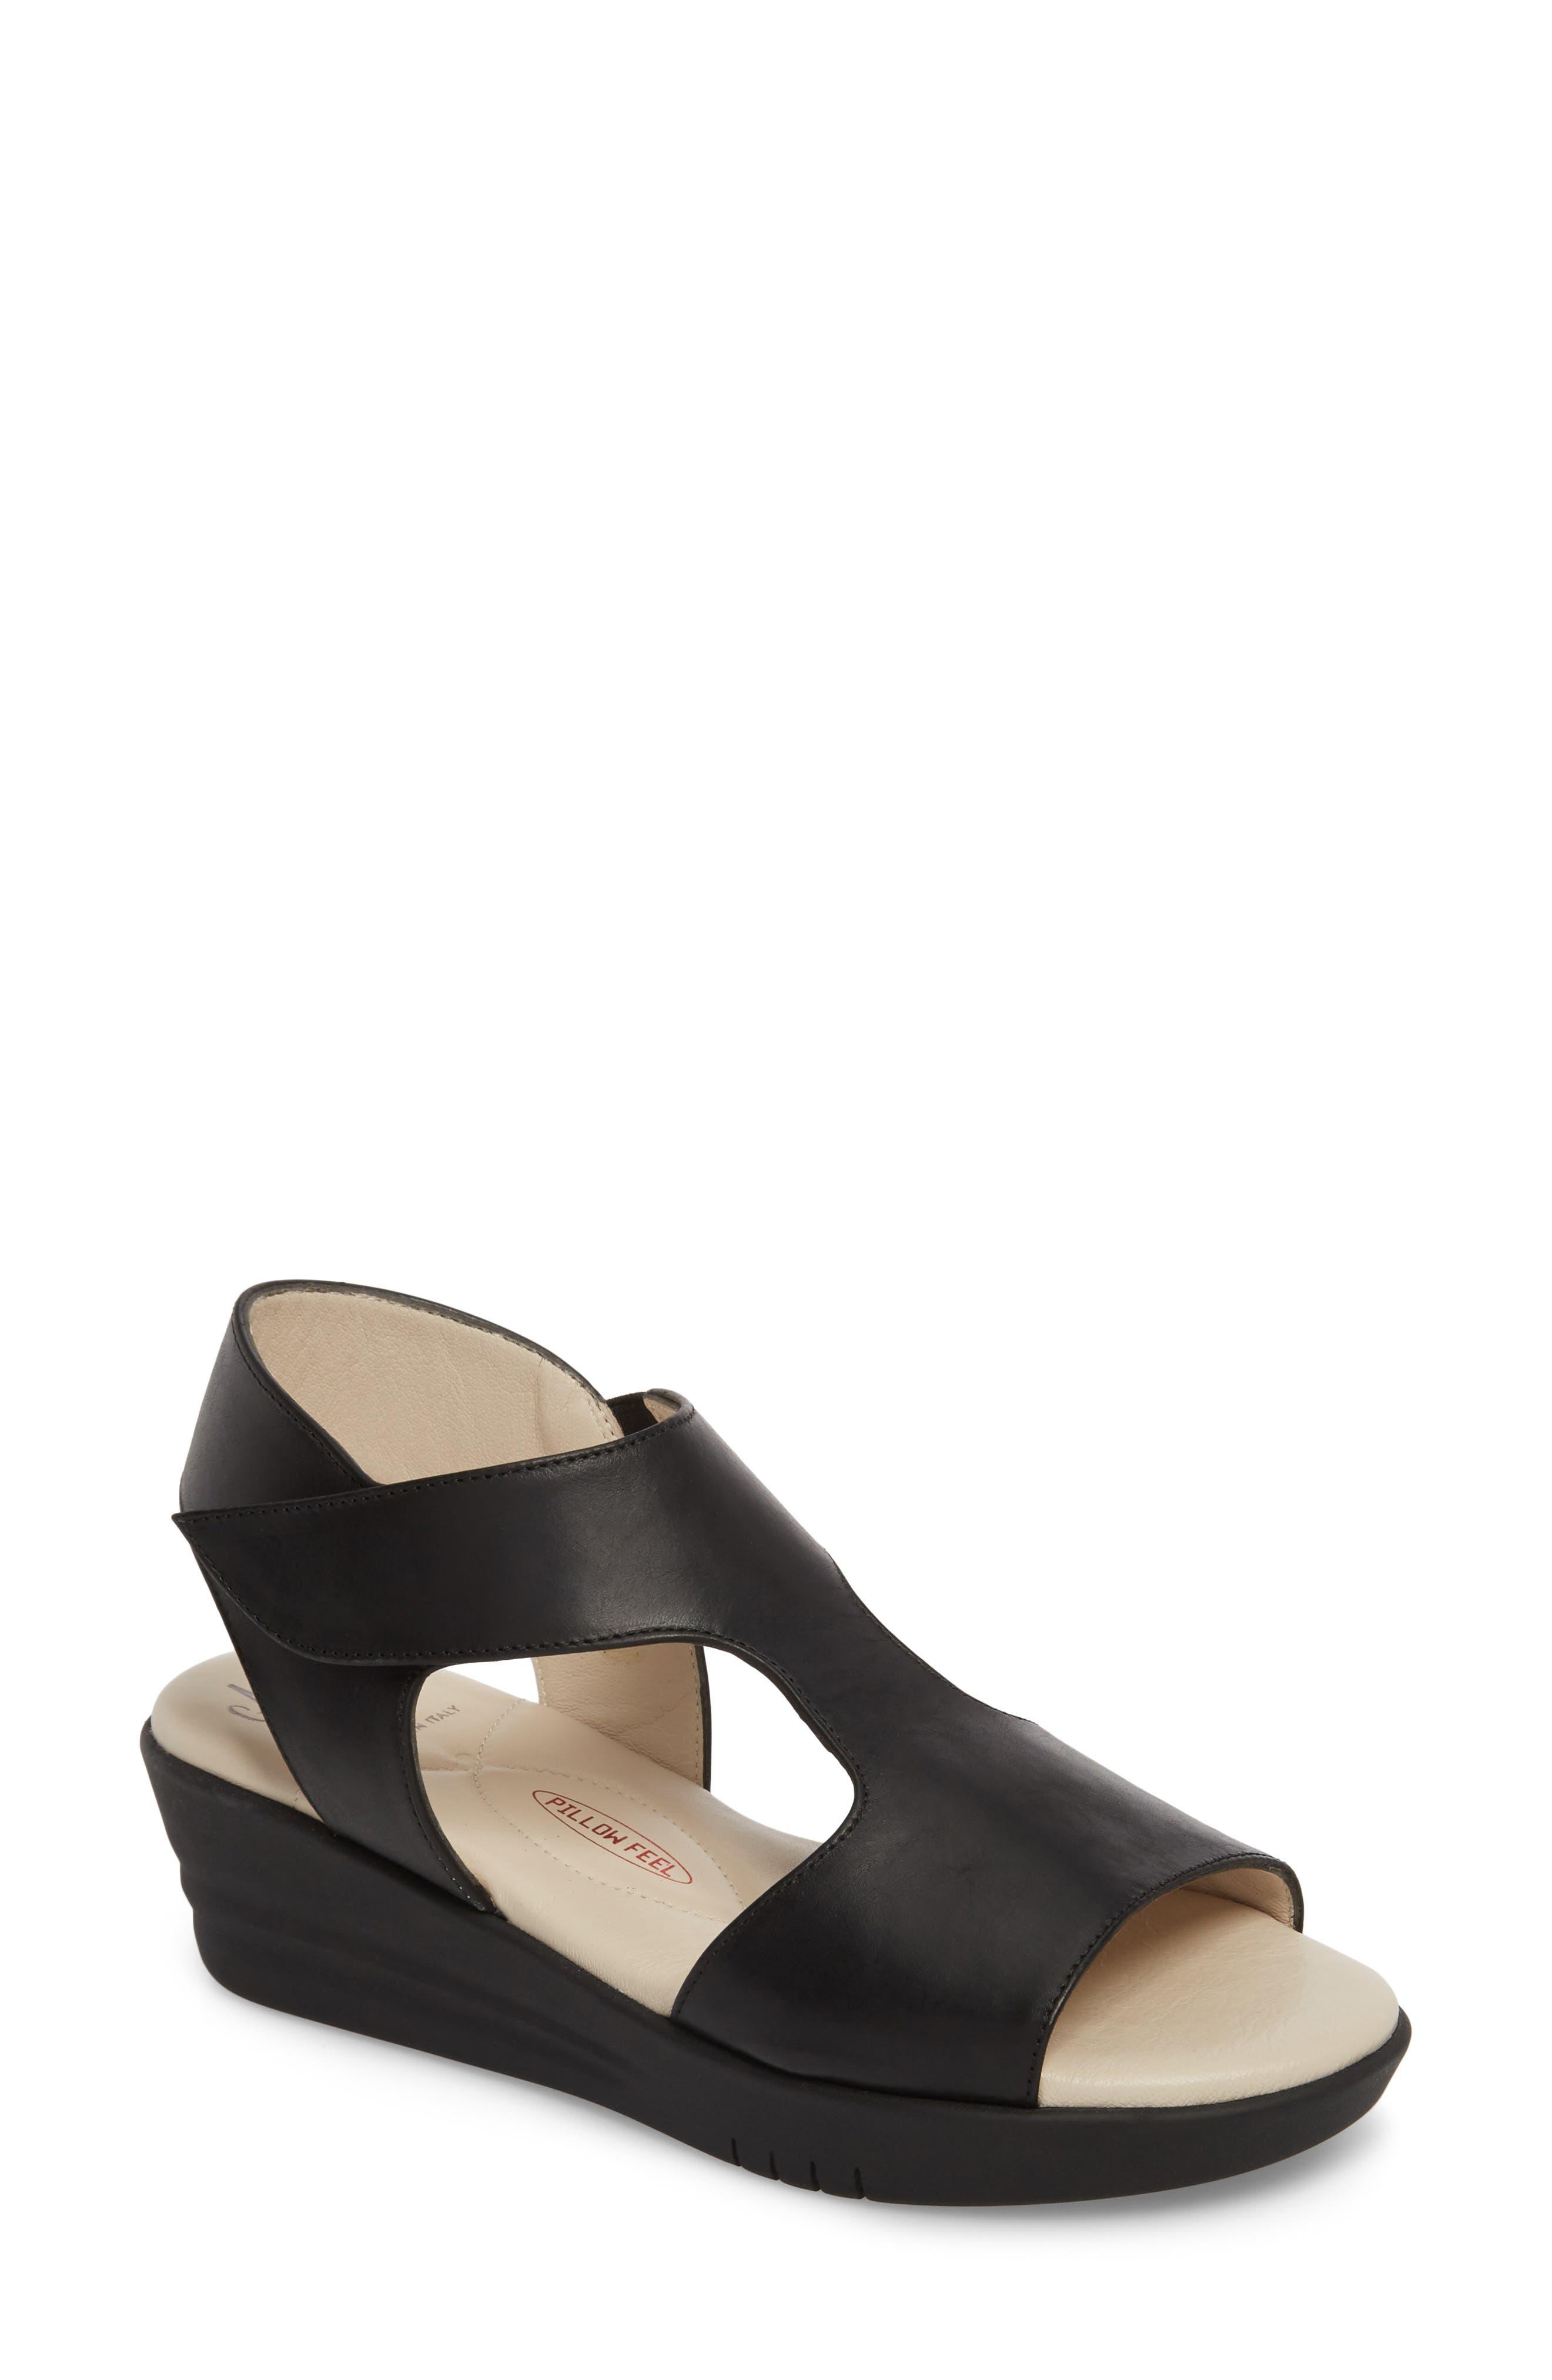 Gabby Platform Sandal,                             Main thumbnail 1, color,                             BLACK LEATHER